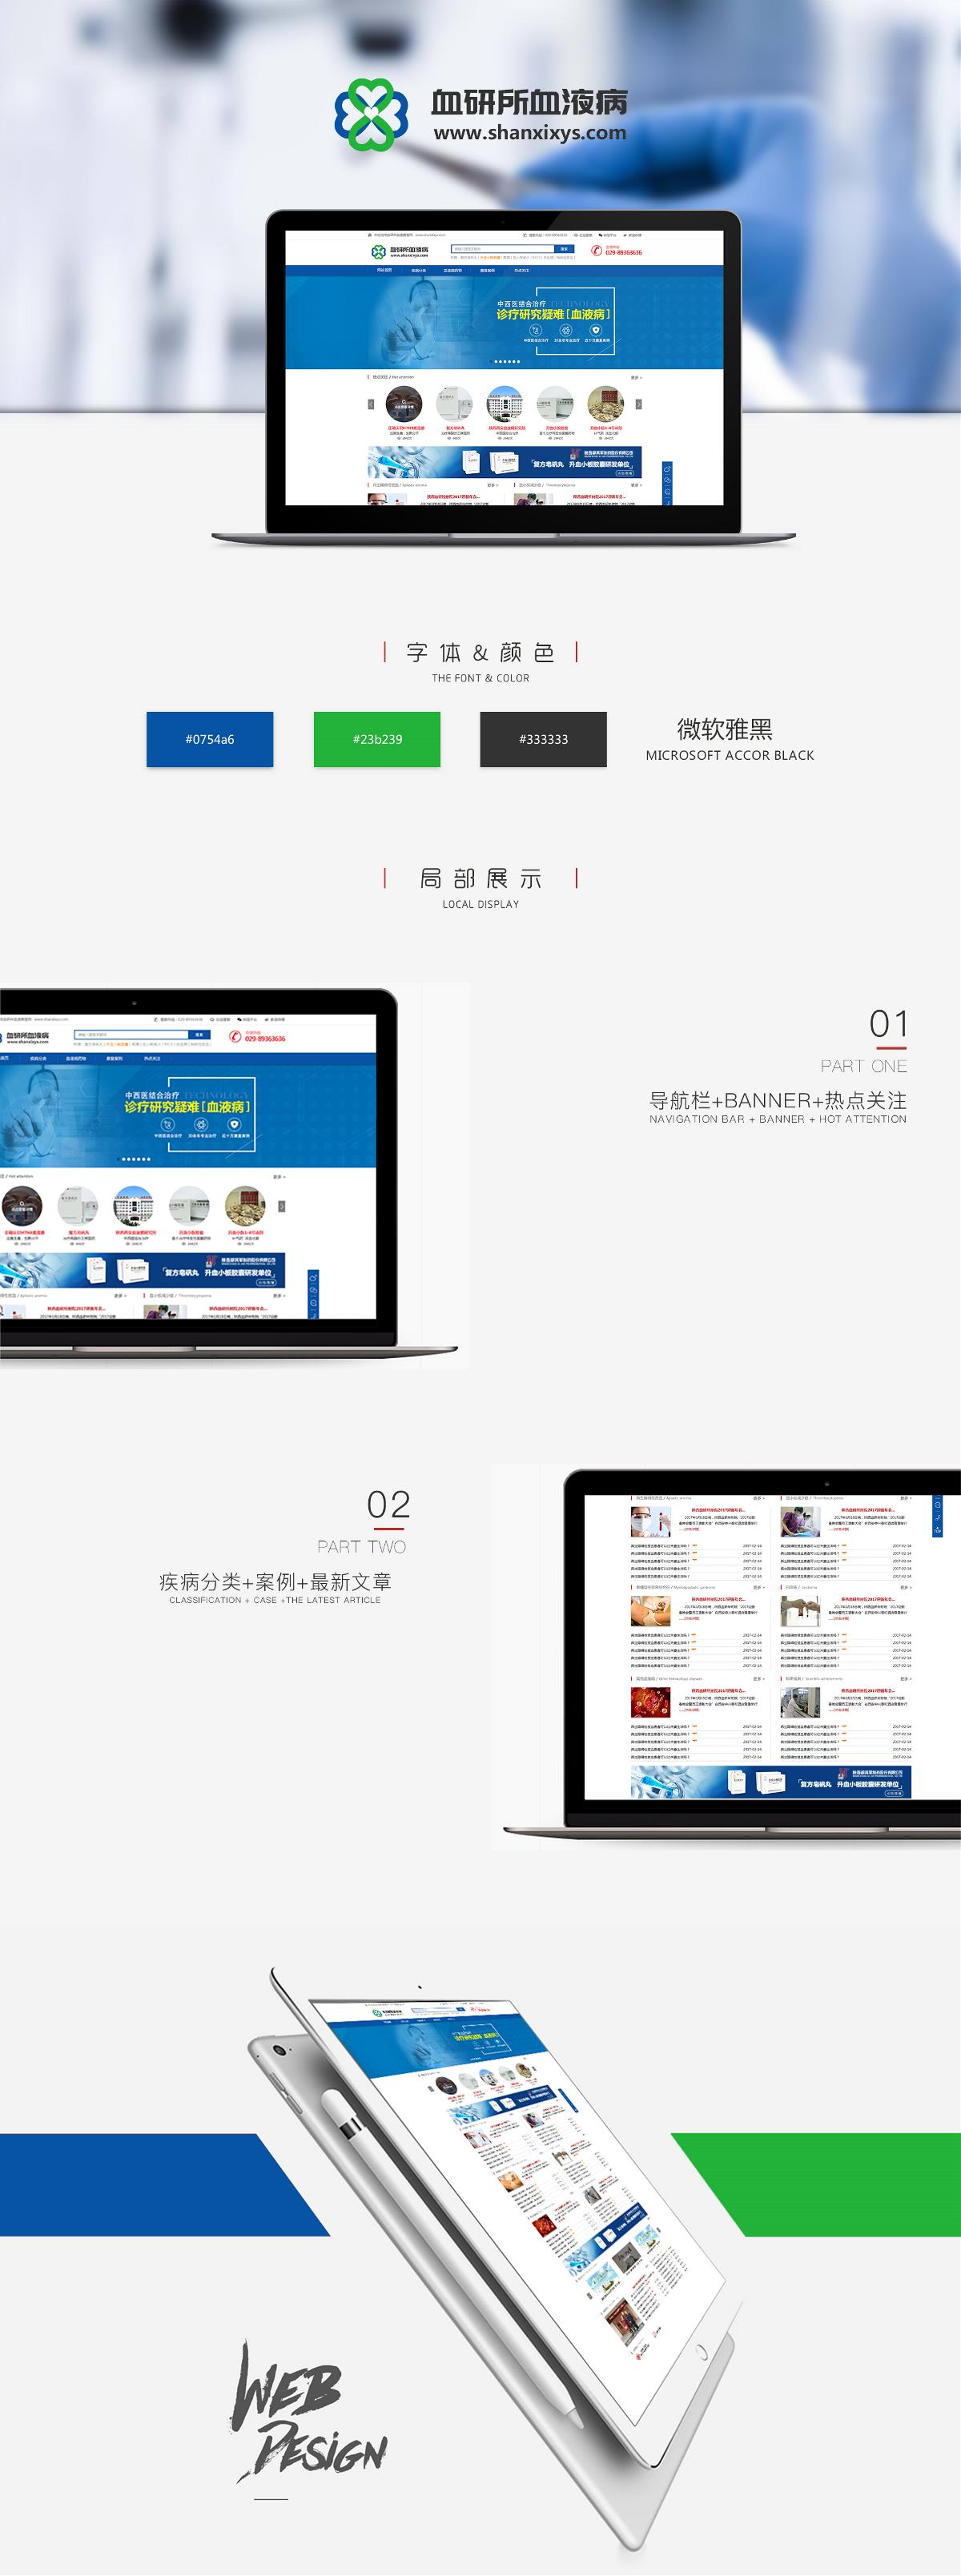 【Morse design】优化站/医疗官网/传统版式